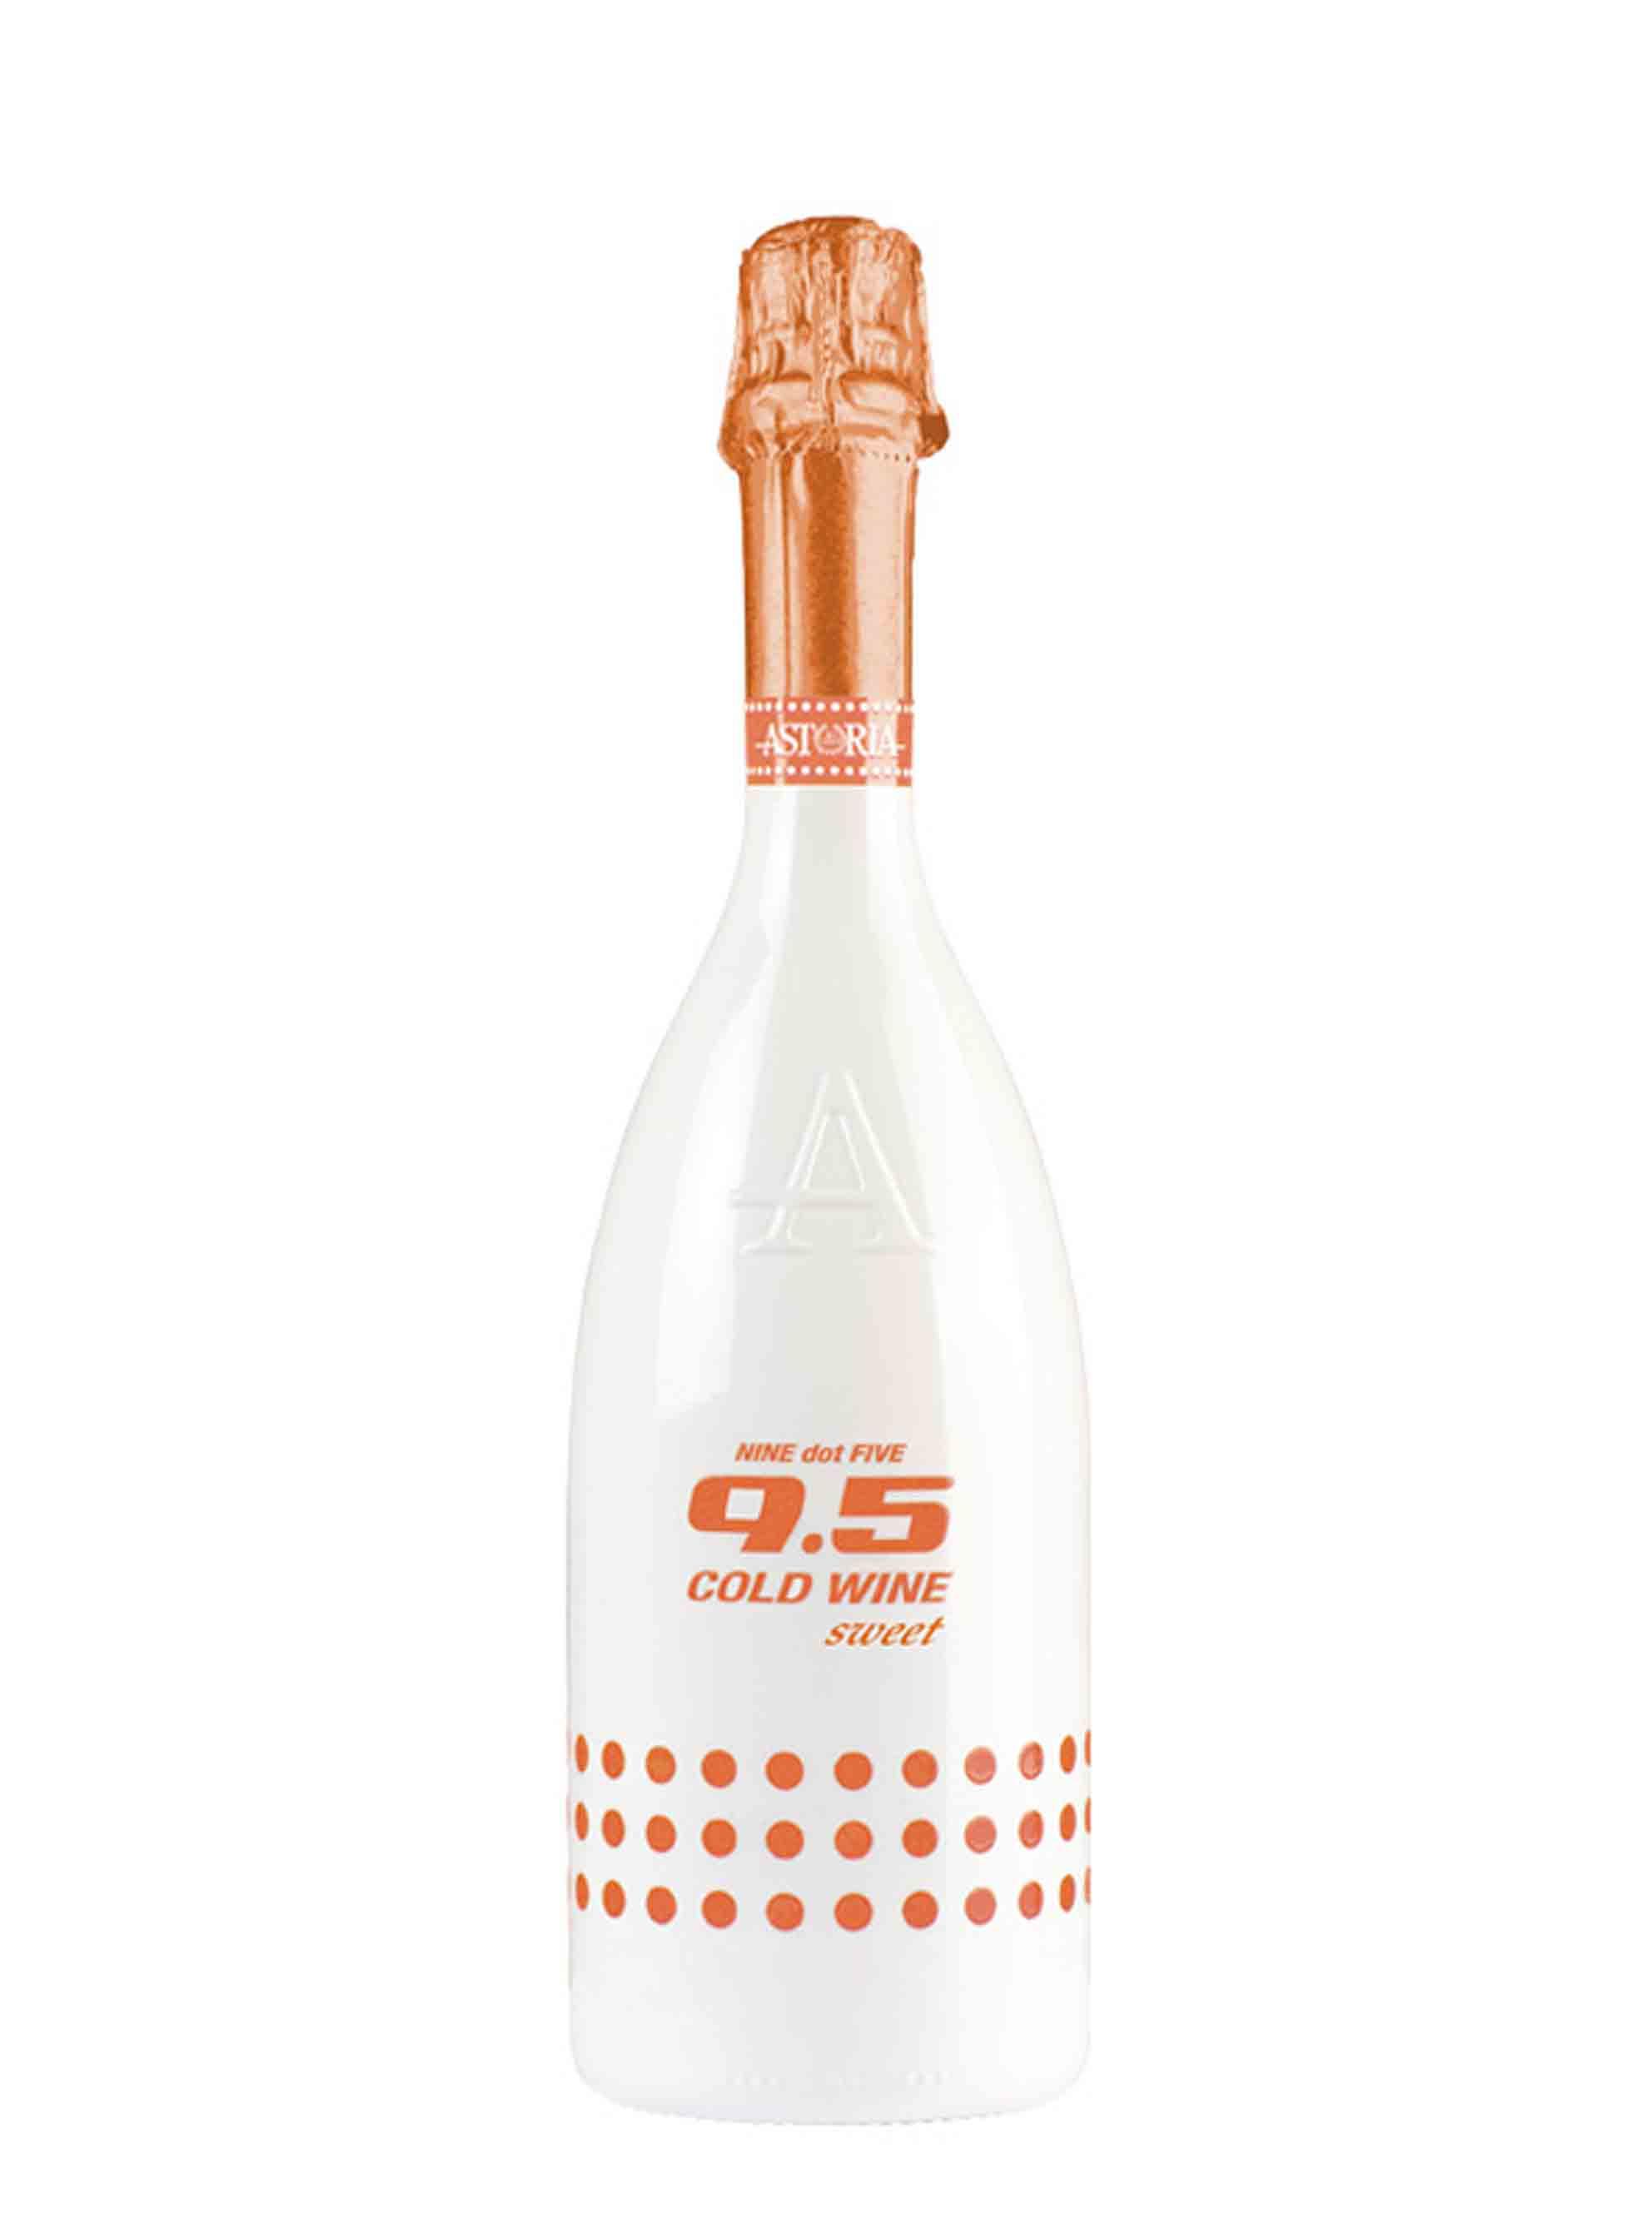 Cuvée, 9.5 Cold Wine, Astoria, 0.75 l